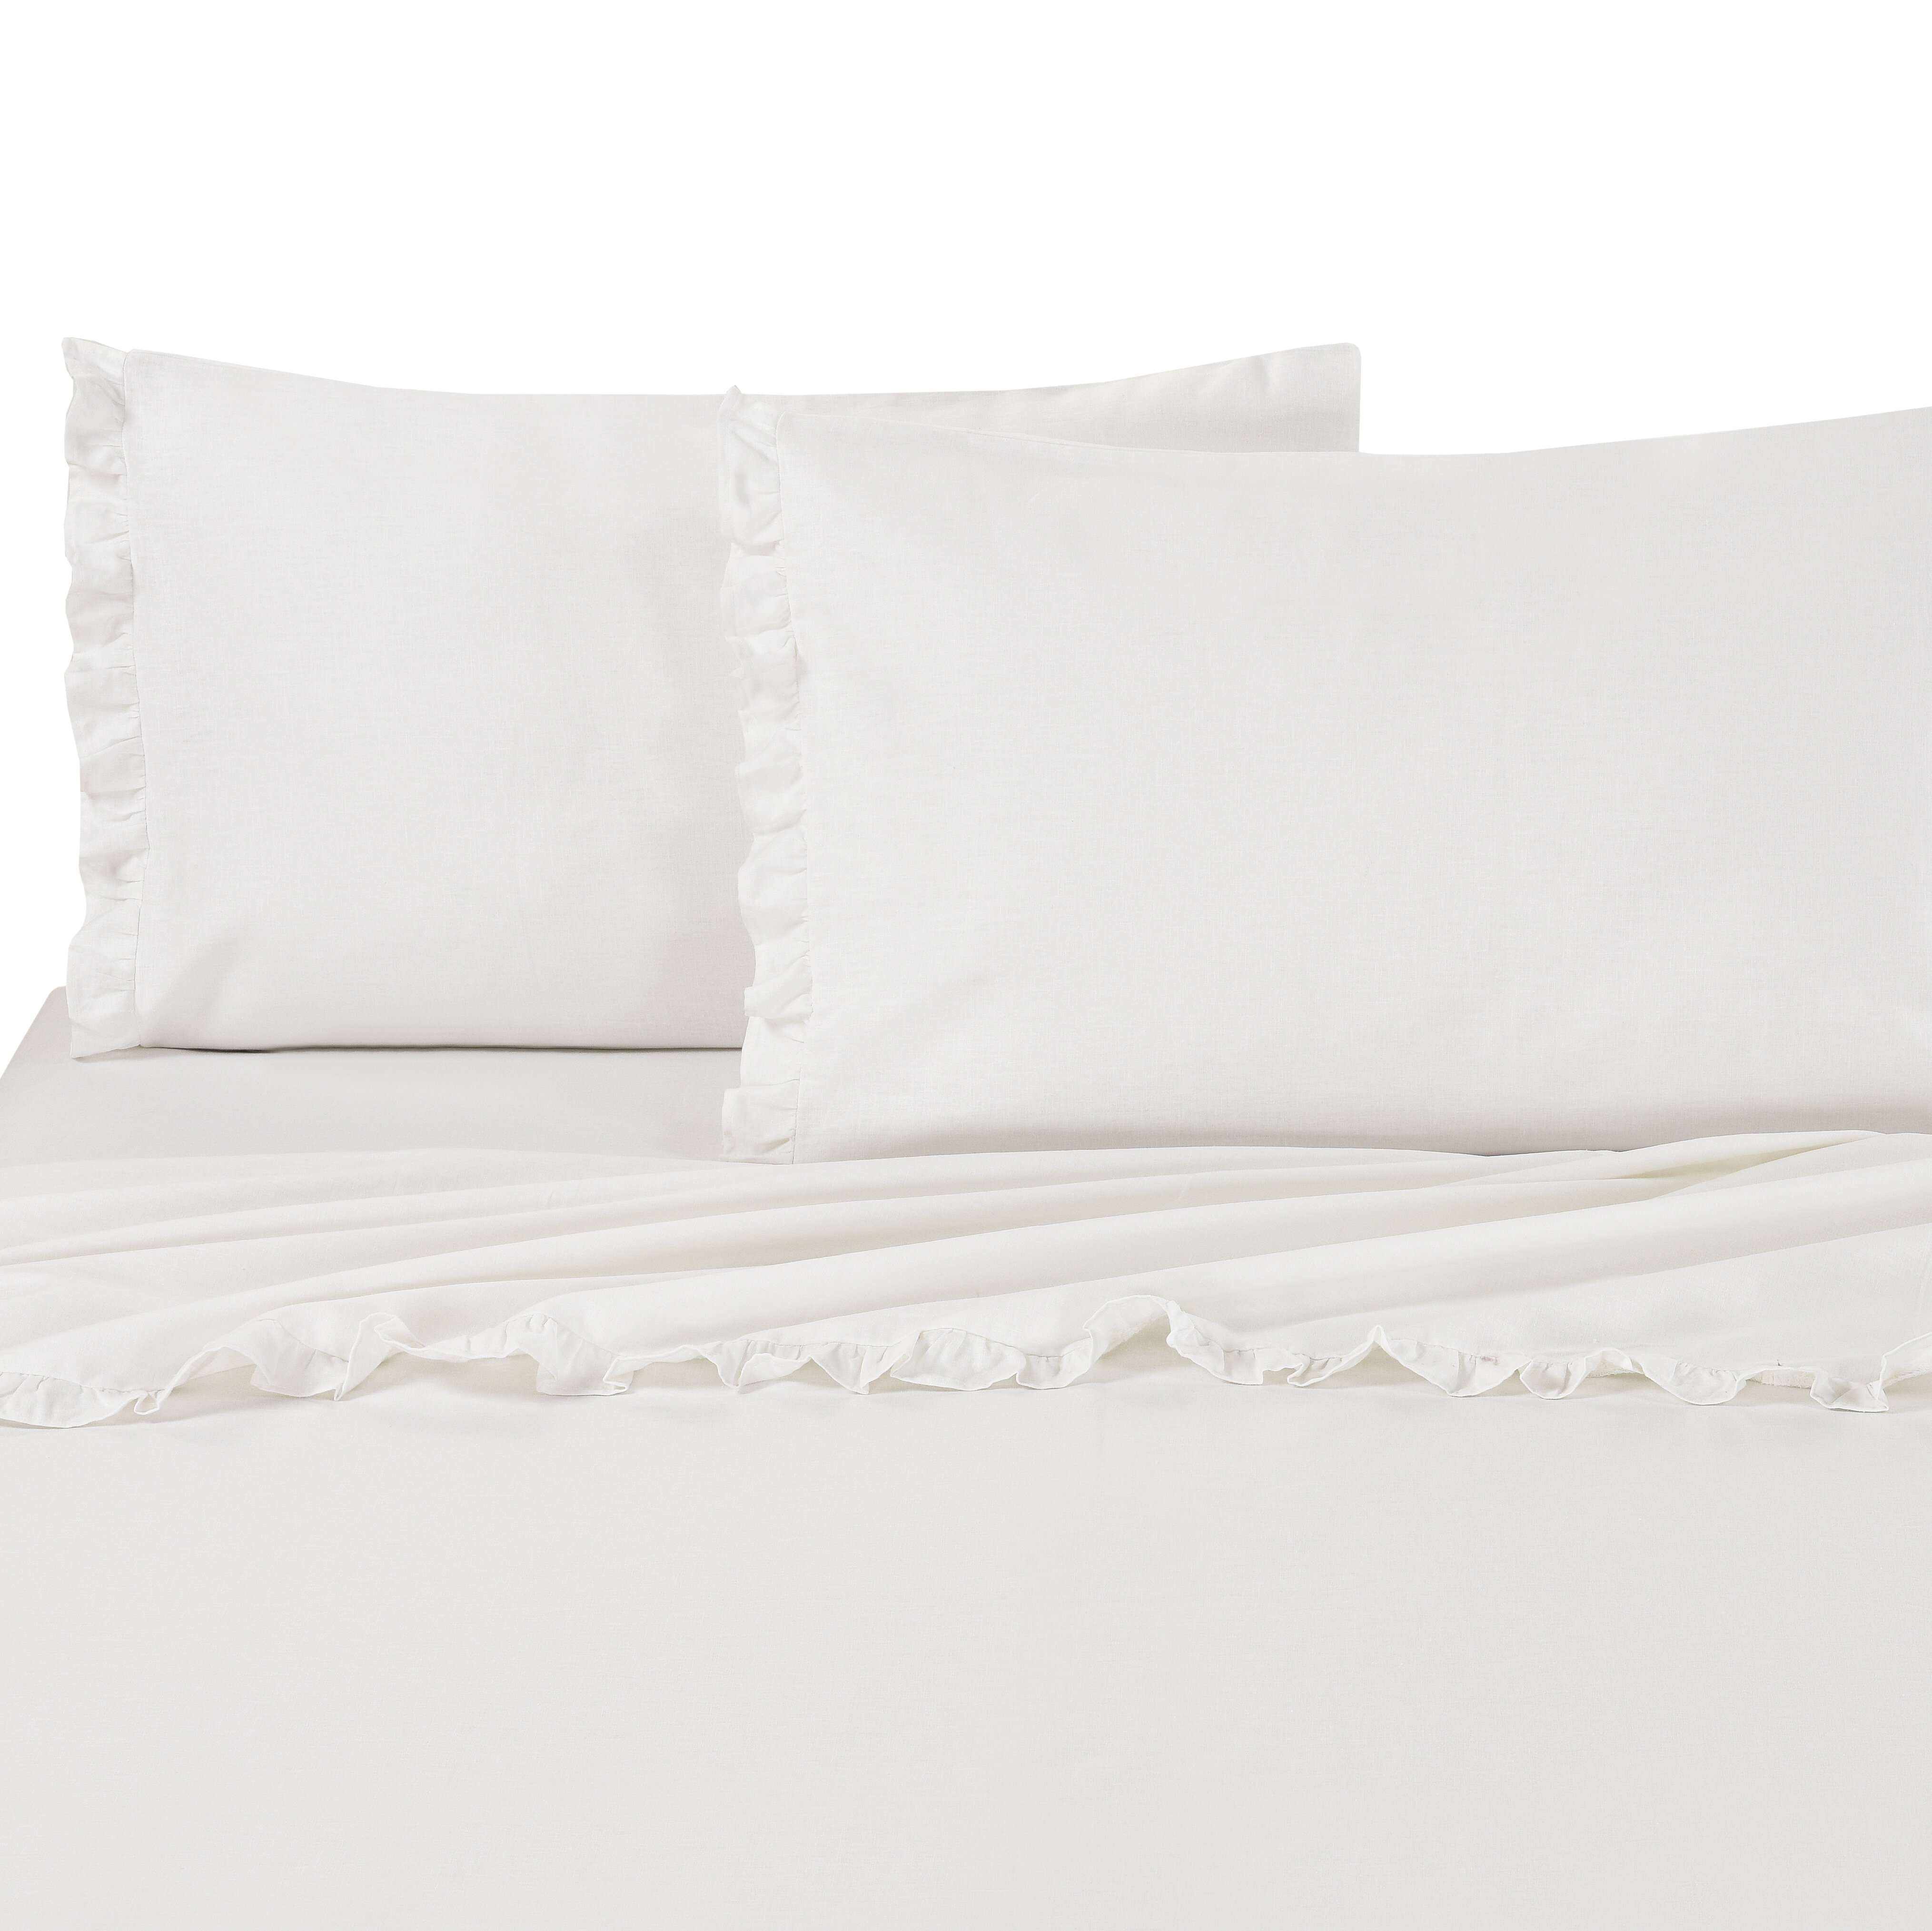 Ophelia Co Dunaway Linen And Cotton Pillow Case Wayfair